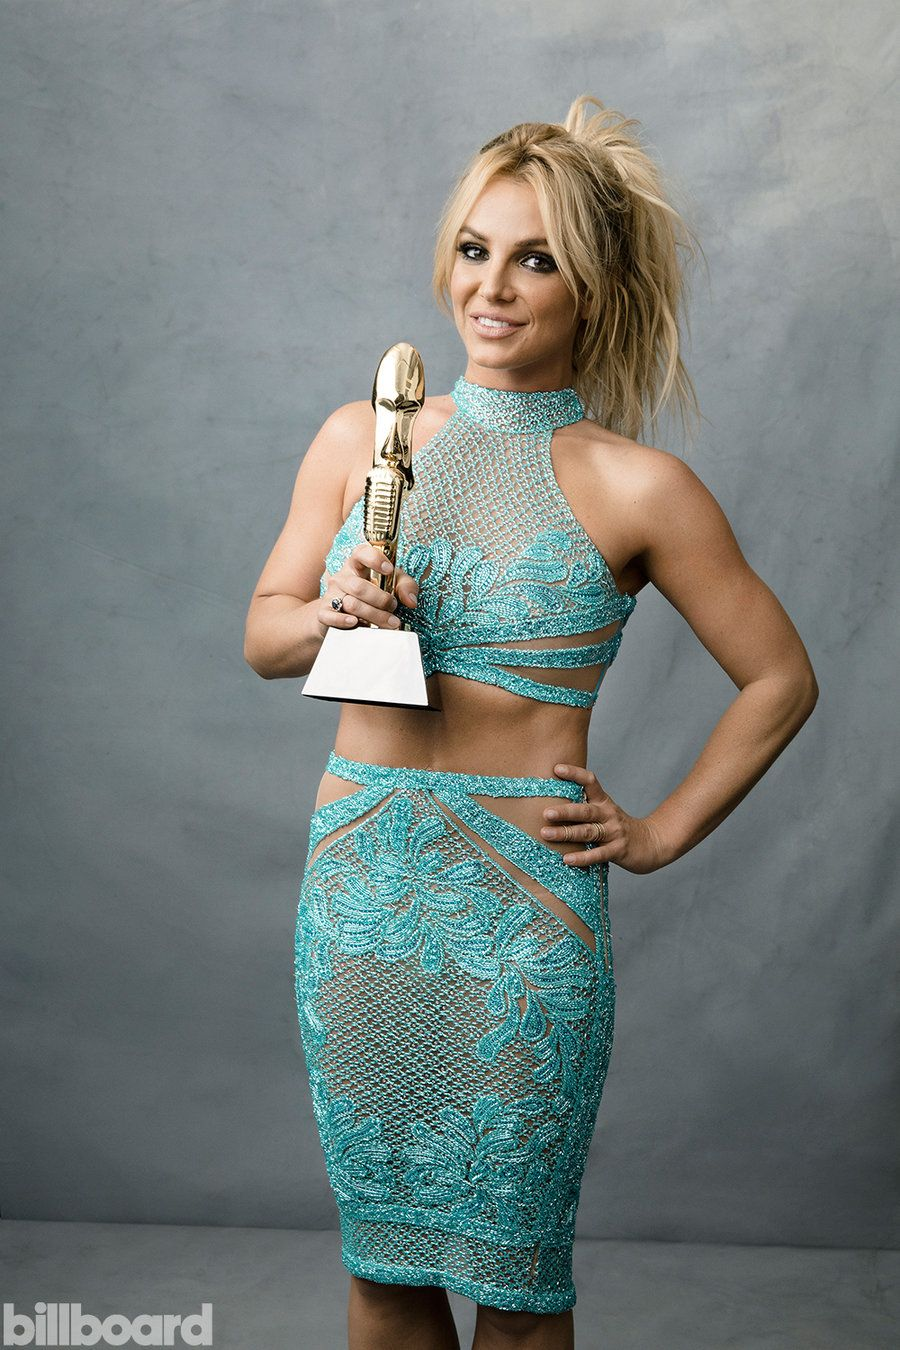 Смотреть Бритни Спирс в Billboard Magazine видео